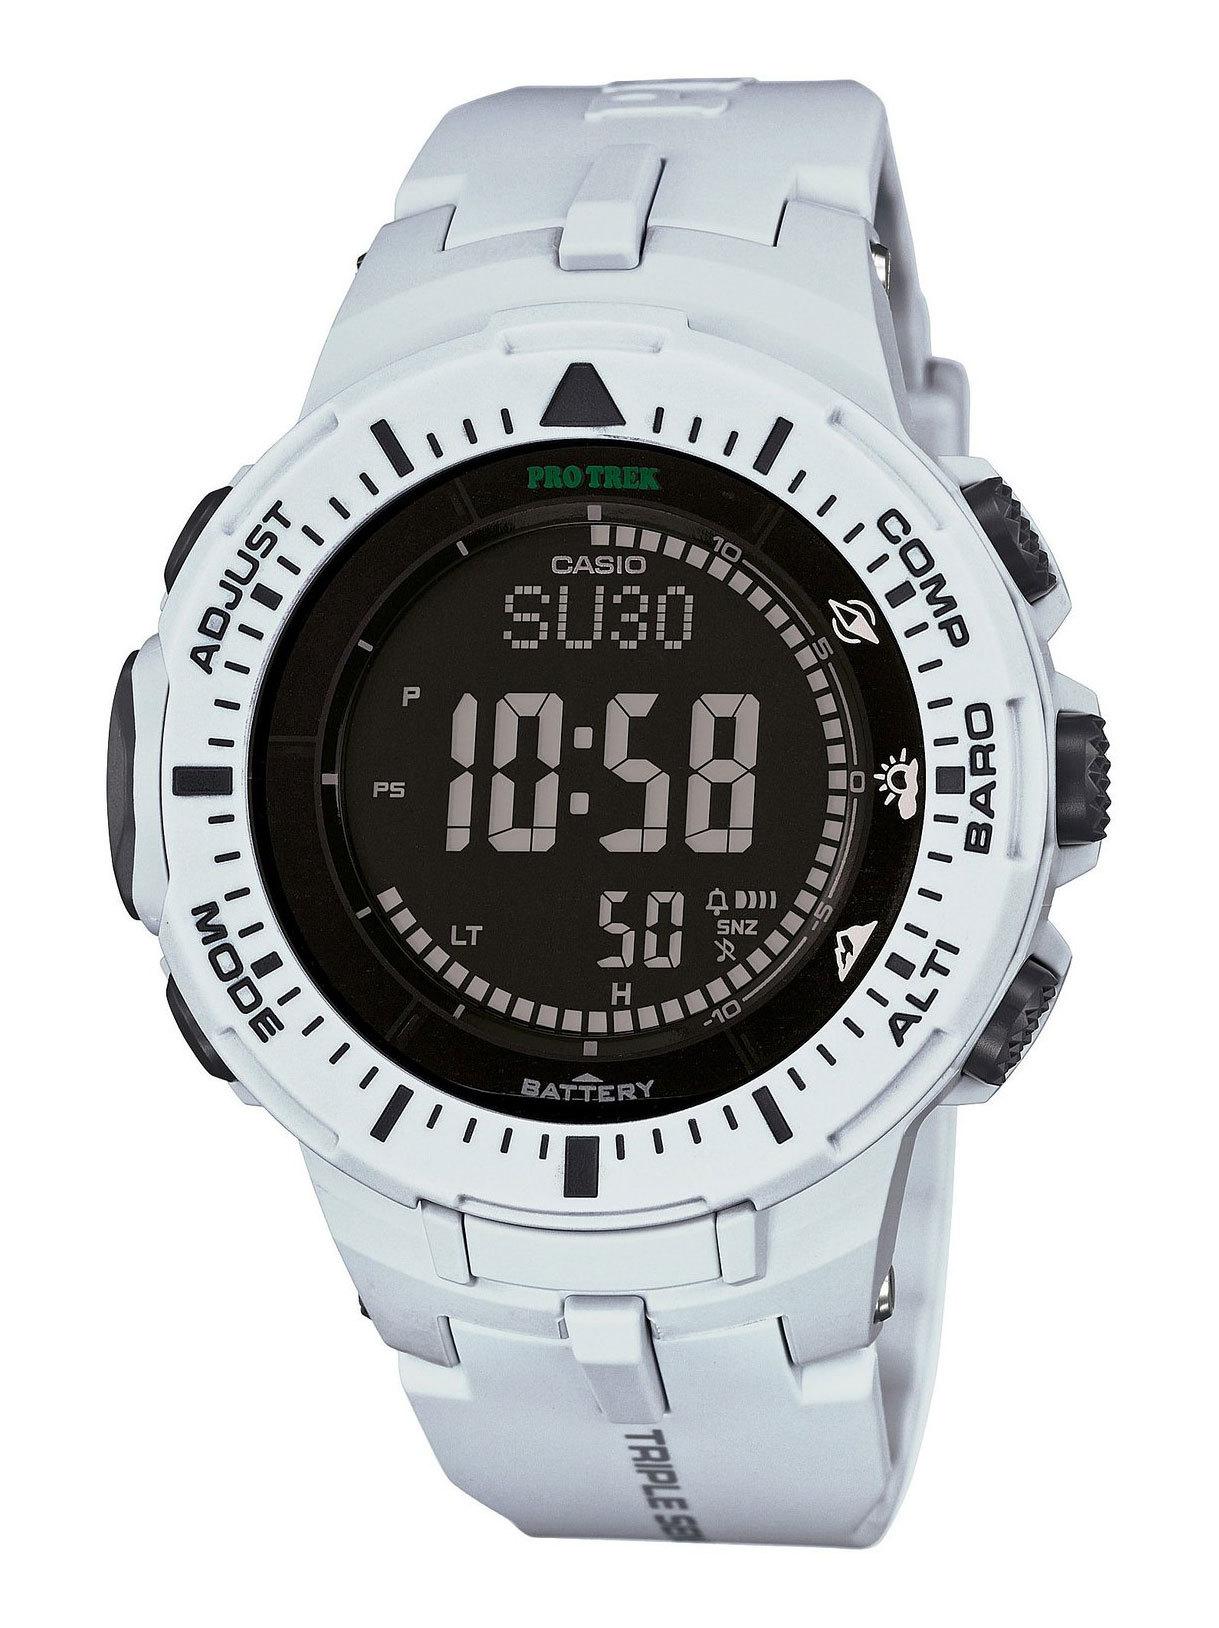 Casio Protrek PRG-300-7E / PRG-300-7ER -  наручные часыCasio<br>Многофункциональные наручные часы с коррекцией времени по радиосигналу,питанием от солнечной батареи, барометром,альтиметром,датчиком температуры, таймером и будильником на полиуриетановом ремешке.<br><br>Бренд: Casio<br>Модель: Casio PRG-300-7E<br>Артикул: PRG-300-7E<br>Вариант артикула: PRG-300-7ER<br>Коллекция: Protrek<br>Подколлекция: None<br>Страна: Япония<br>Пол: None<br>Тип механизма: None<br>Механизм: None<br>Количество камней: None<br>Автоподзавод: None<br>Источник энергии: None<br>Срок службы элемента питания: None<br>Дисплей: None<br>Цифры: None<br>Водозащита: None<br>Противоударные: None<br>Материал корпуса: None<br>Материал браслета: None<br>Материал безеля: None<br>Стекло: None<br>Антибликовое покрытие: None<br>Цвет корпуса: None<br>Цвет браслета: None<br>Цвет циферблата: None<br>Цвет безеля: None<br>Размеры: None<br>Диаметр: None<br>Диаметр корпуса: None<br>Толщина: None<br>Ширина ремешка: None<br>Вес: None<br>Спорт-функции: None<br>Подсветка: None<br>Вставка: None<br>Отображение даты: None<br>Хронограф: None<br>Таймер: None<br>Термометр: None<br>Хронометр: None<br>GPS: None<br>Радиосинхронизация: None<br>Барометр: None<br>Скелетон: None<br>Дополнительная информация: None<br>Дополнительные функции: None